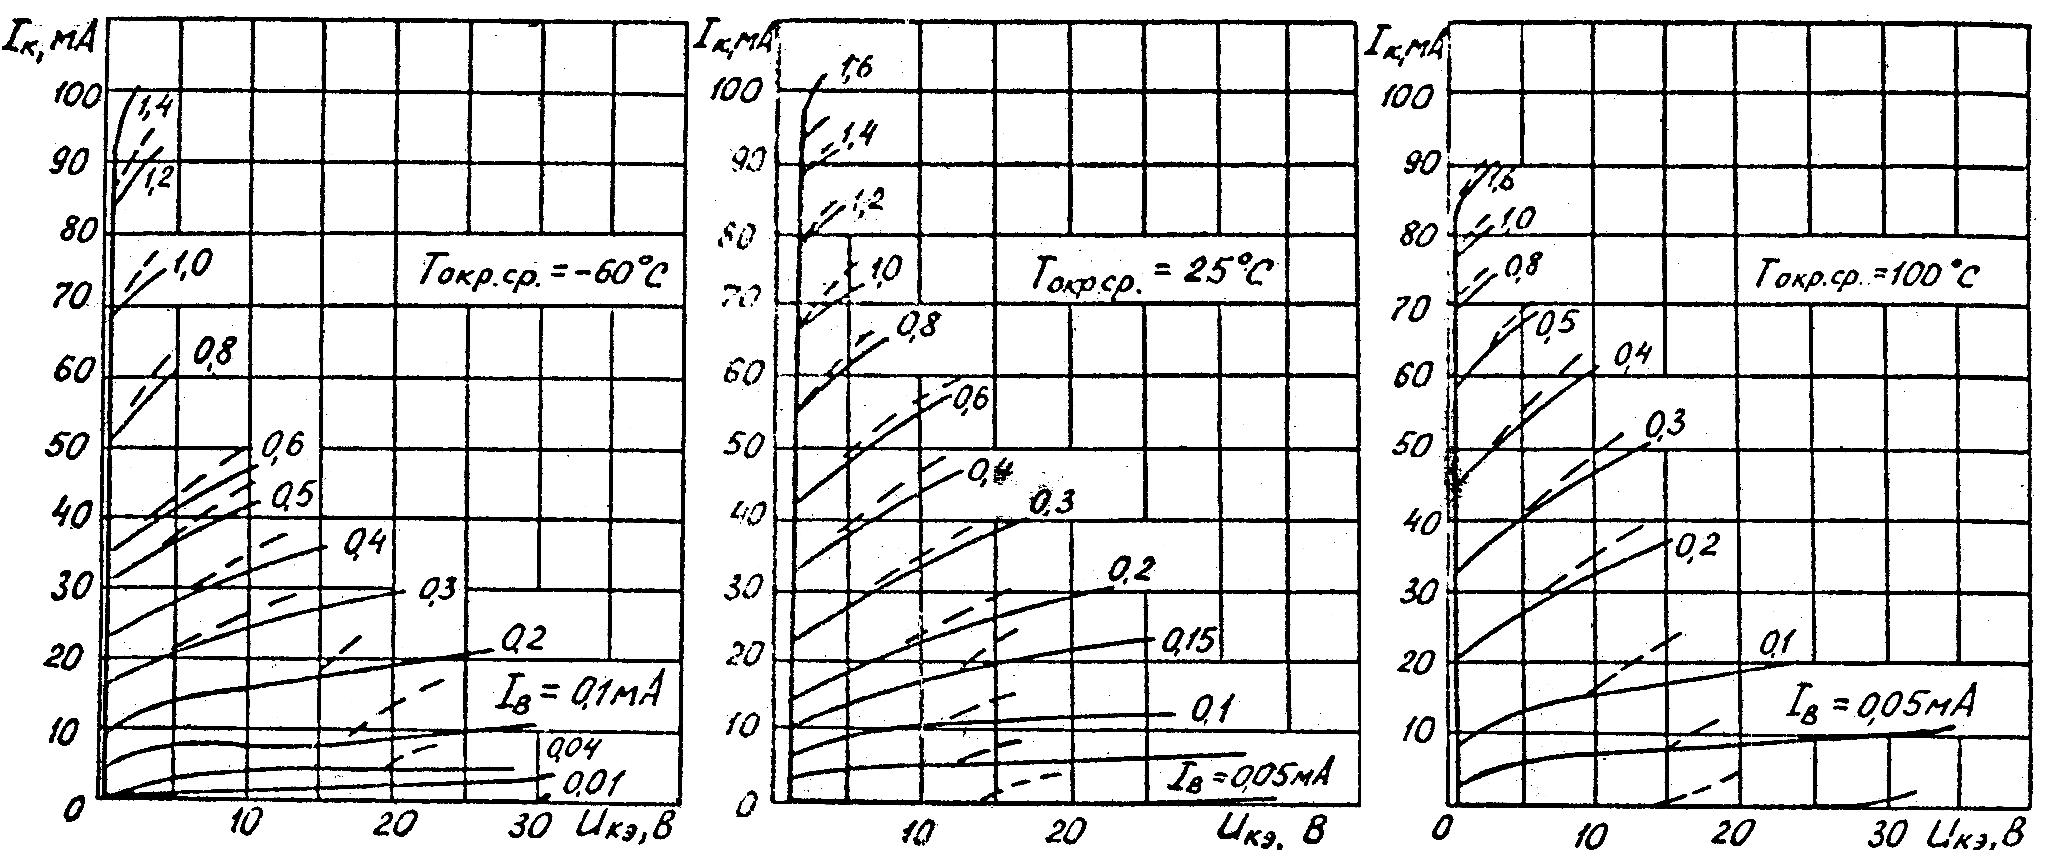 Типовые выходные характеристики транзисторов КТ361Б, КТ361Г, КТ361Г1, КТ361Е, КТ361Ж, КТ361И, КТ361К, КТ361Л, КТ361М, КТ361П